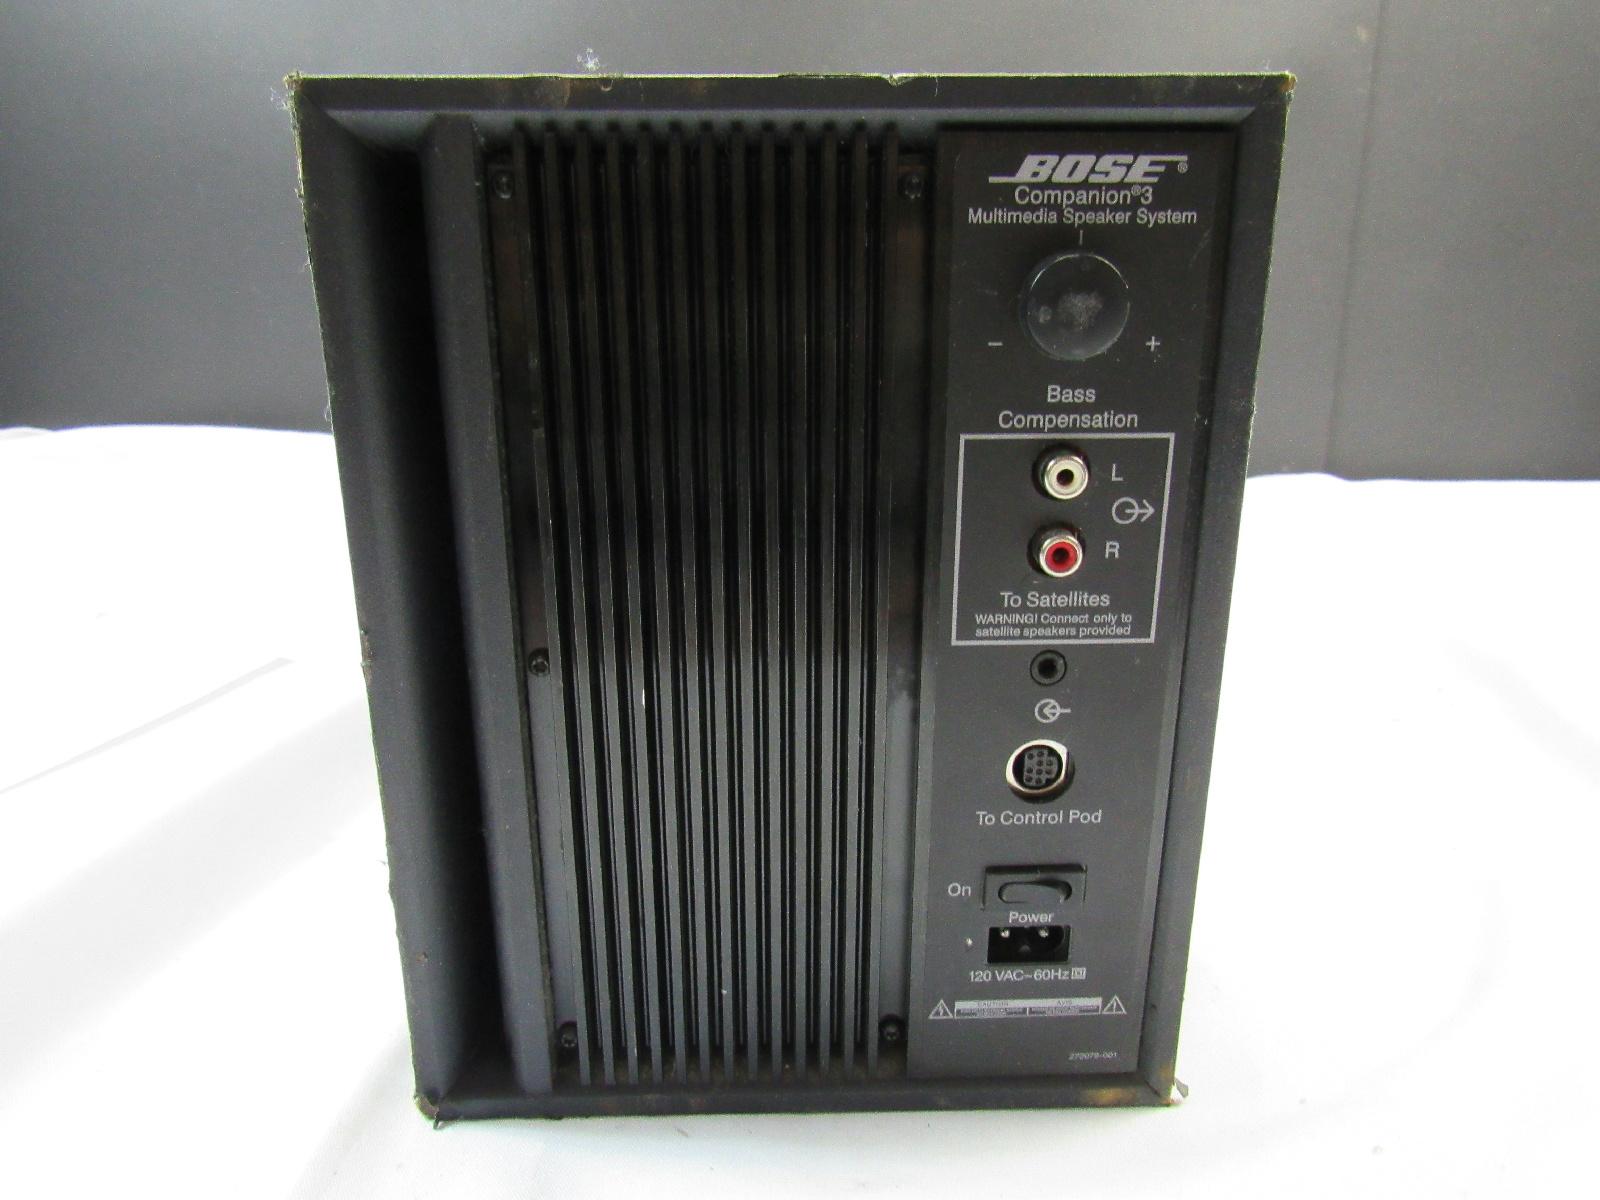 Bose 3 Multimedia Subwoofer Speaker